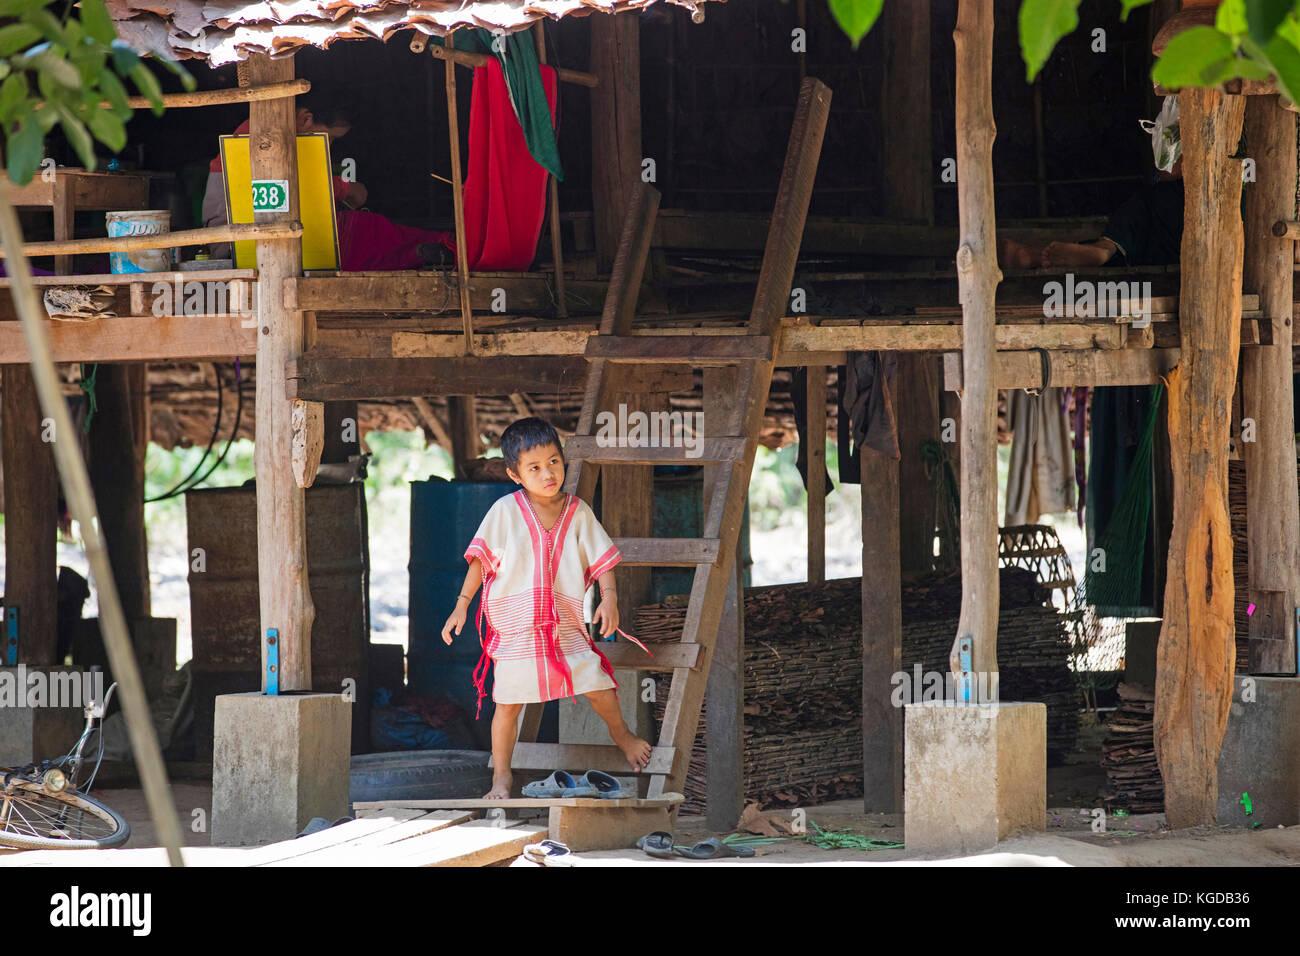 Bamar child in front of pile dwelling in Kayin village near the town of Hpa-an, Kayin State / Karen State, Myanmar - Stock Image